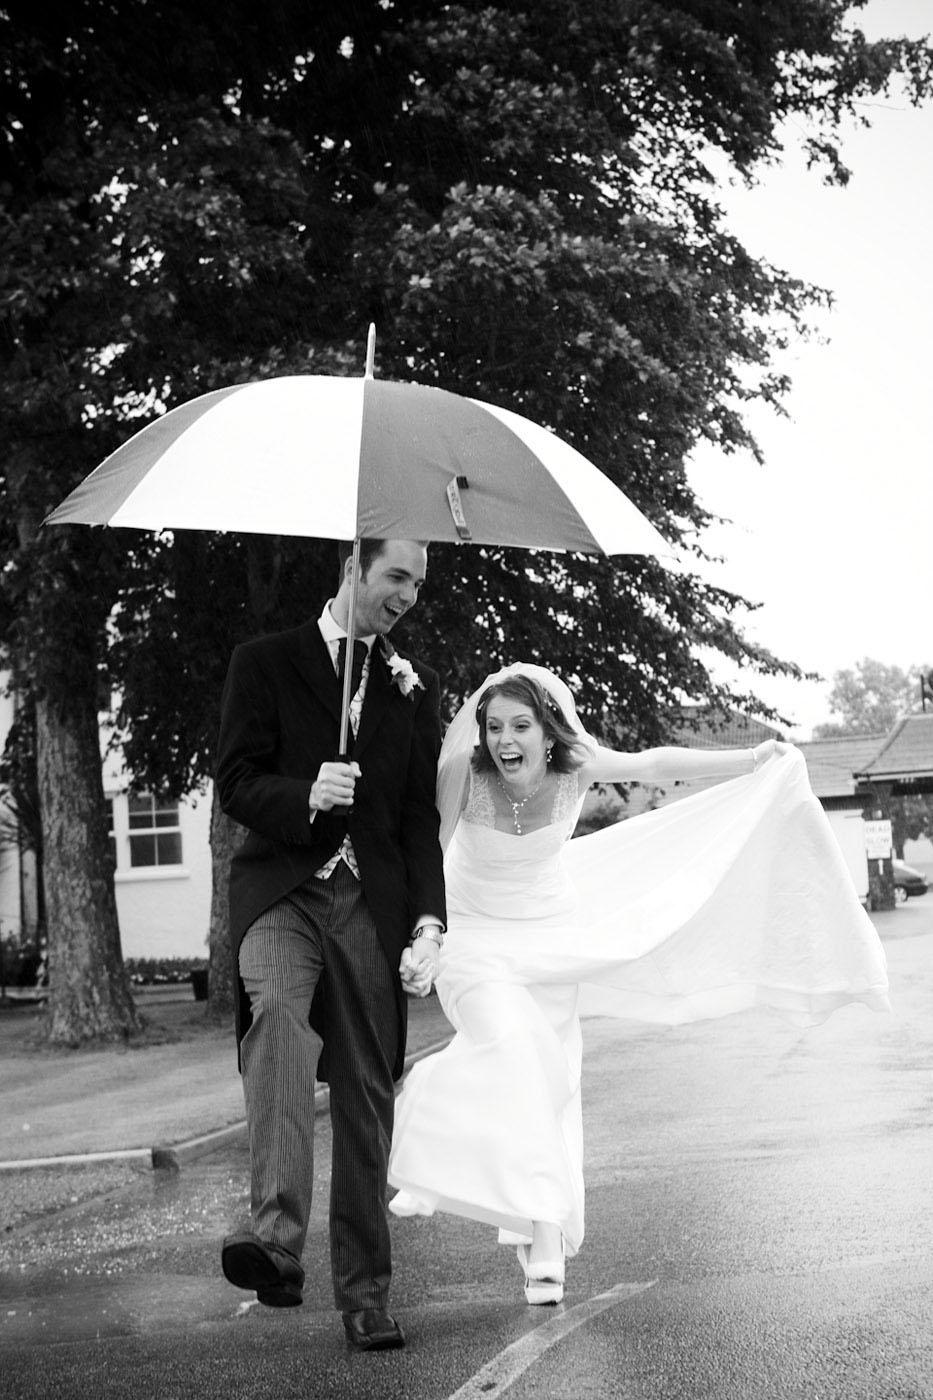 dan_burman_wedding_photography (28).jpg